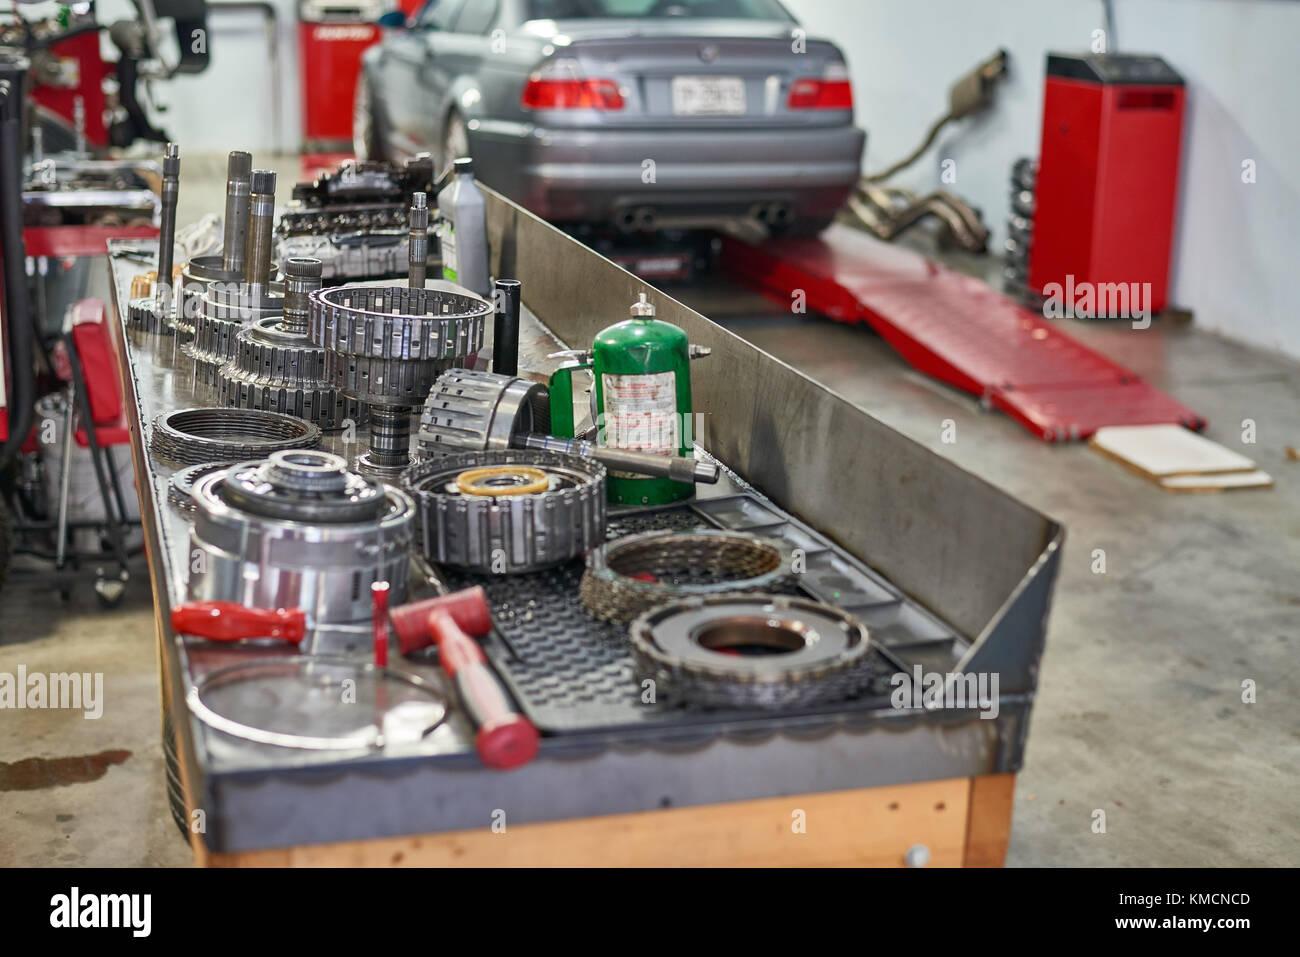 Transmission Rebuild - Stock Image